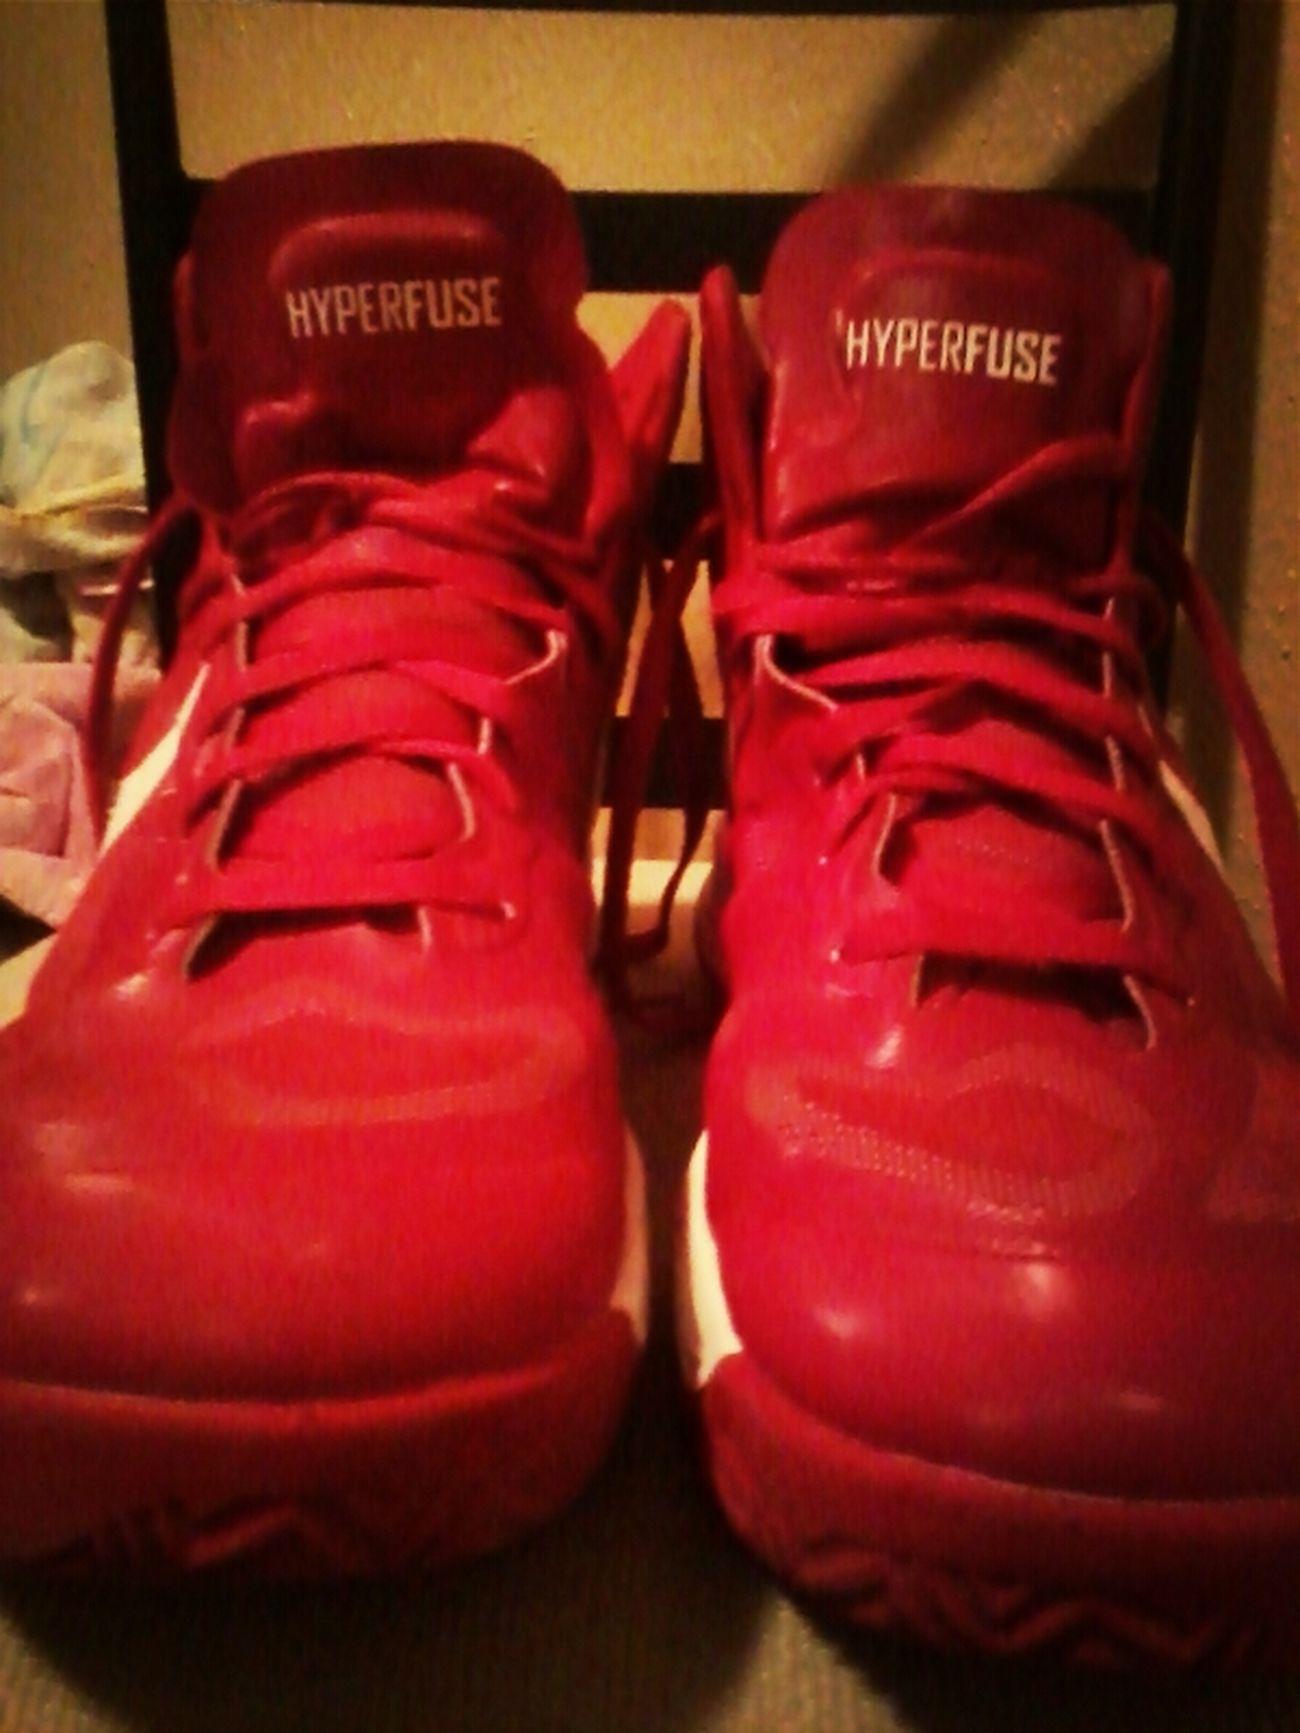 Hyperfuse